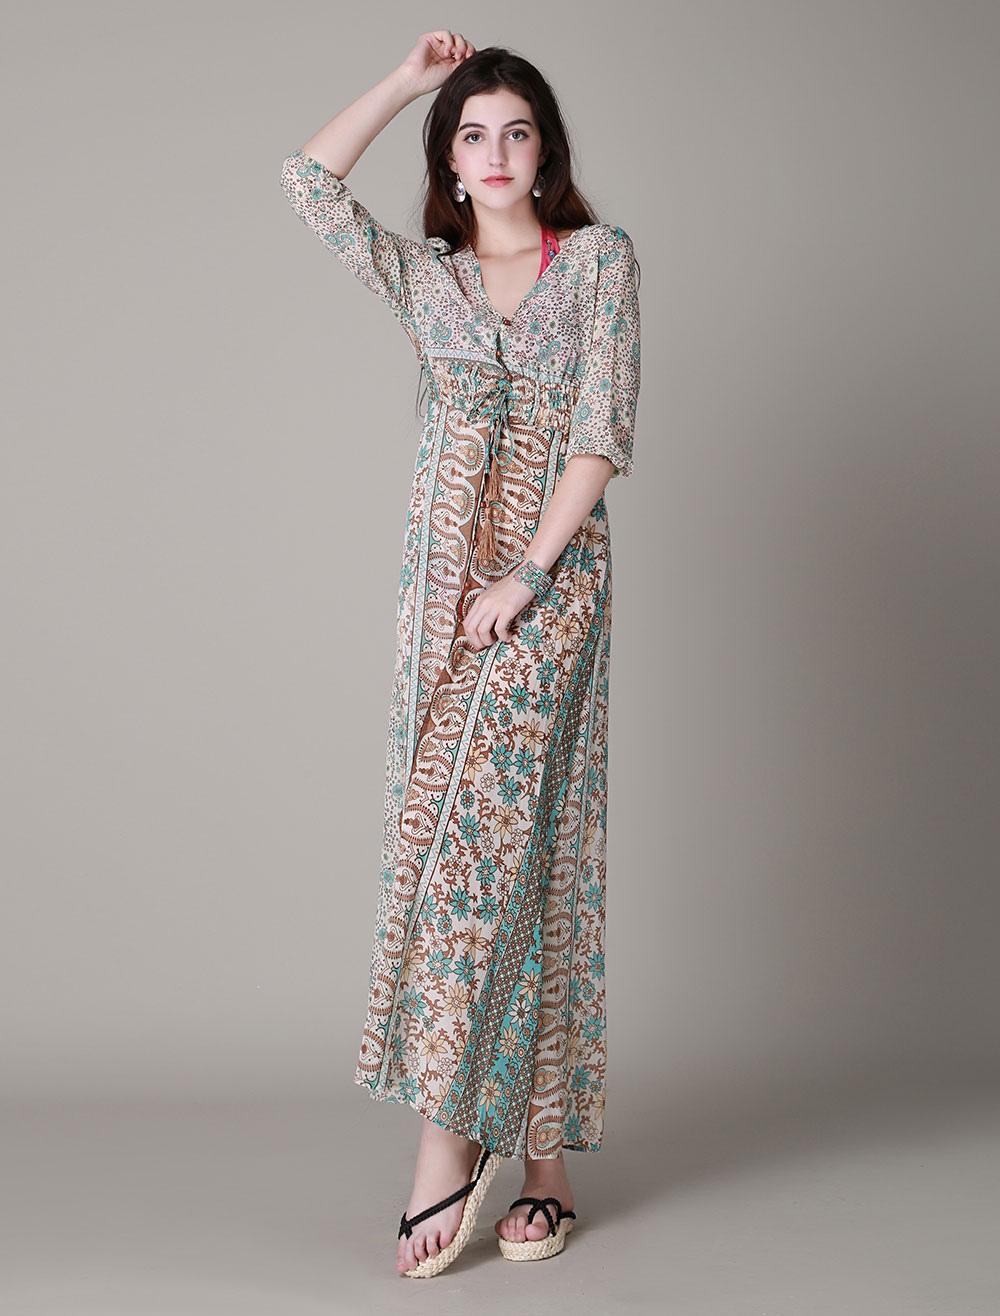 807d1b5a4a43e Long Sleeve Printed High splits BOHO Maxi Dress - Milanoo.com